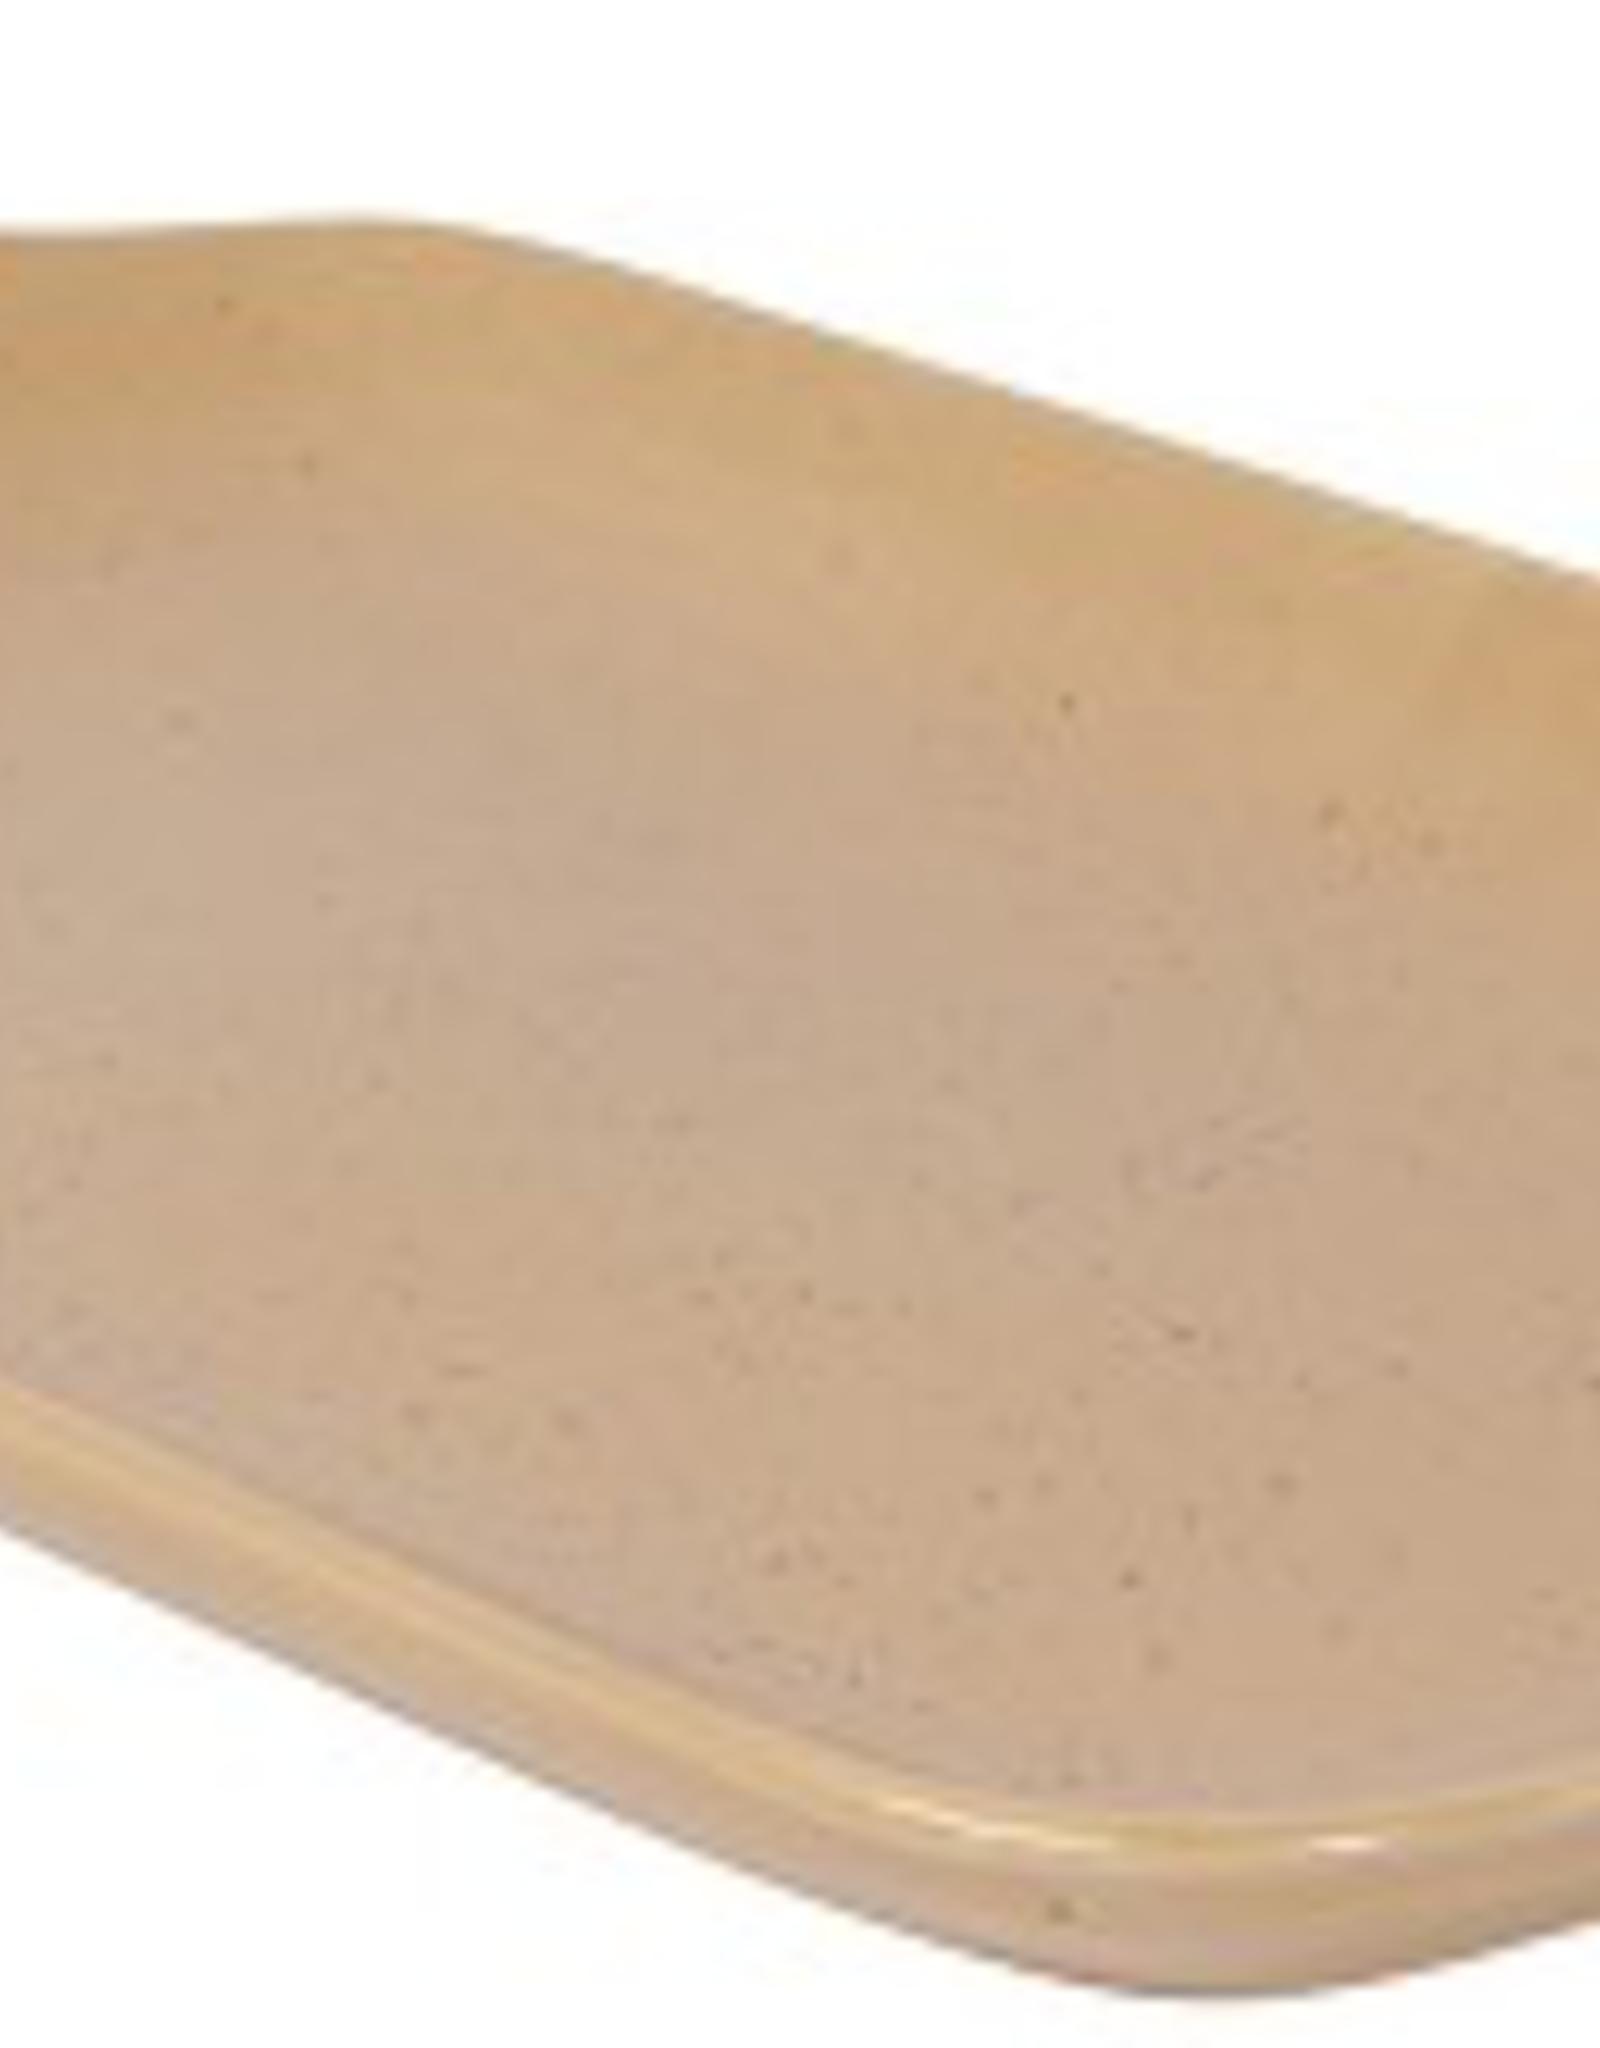 Terrain Ceramic Serving Tray Maize